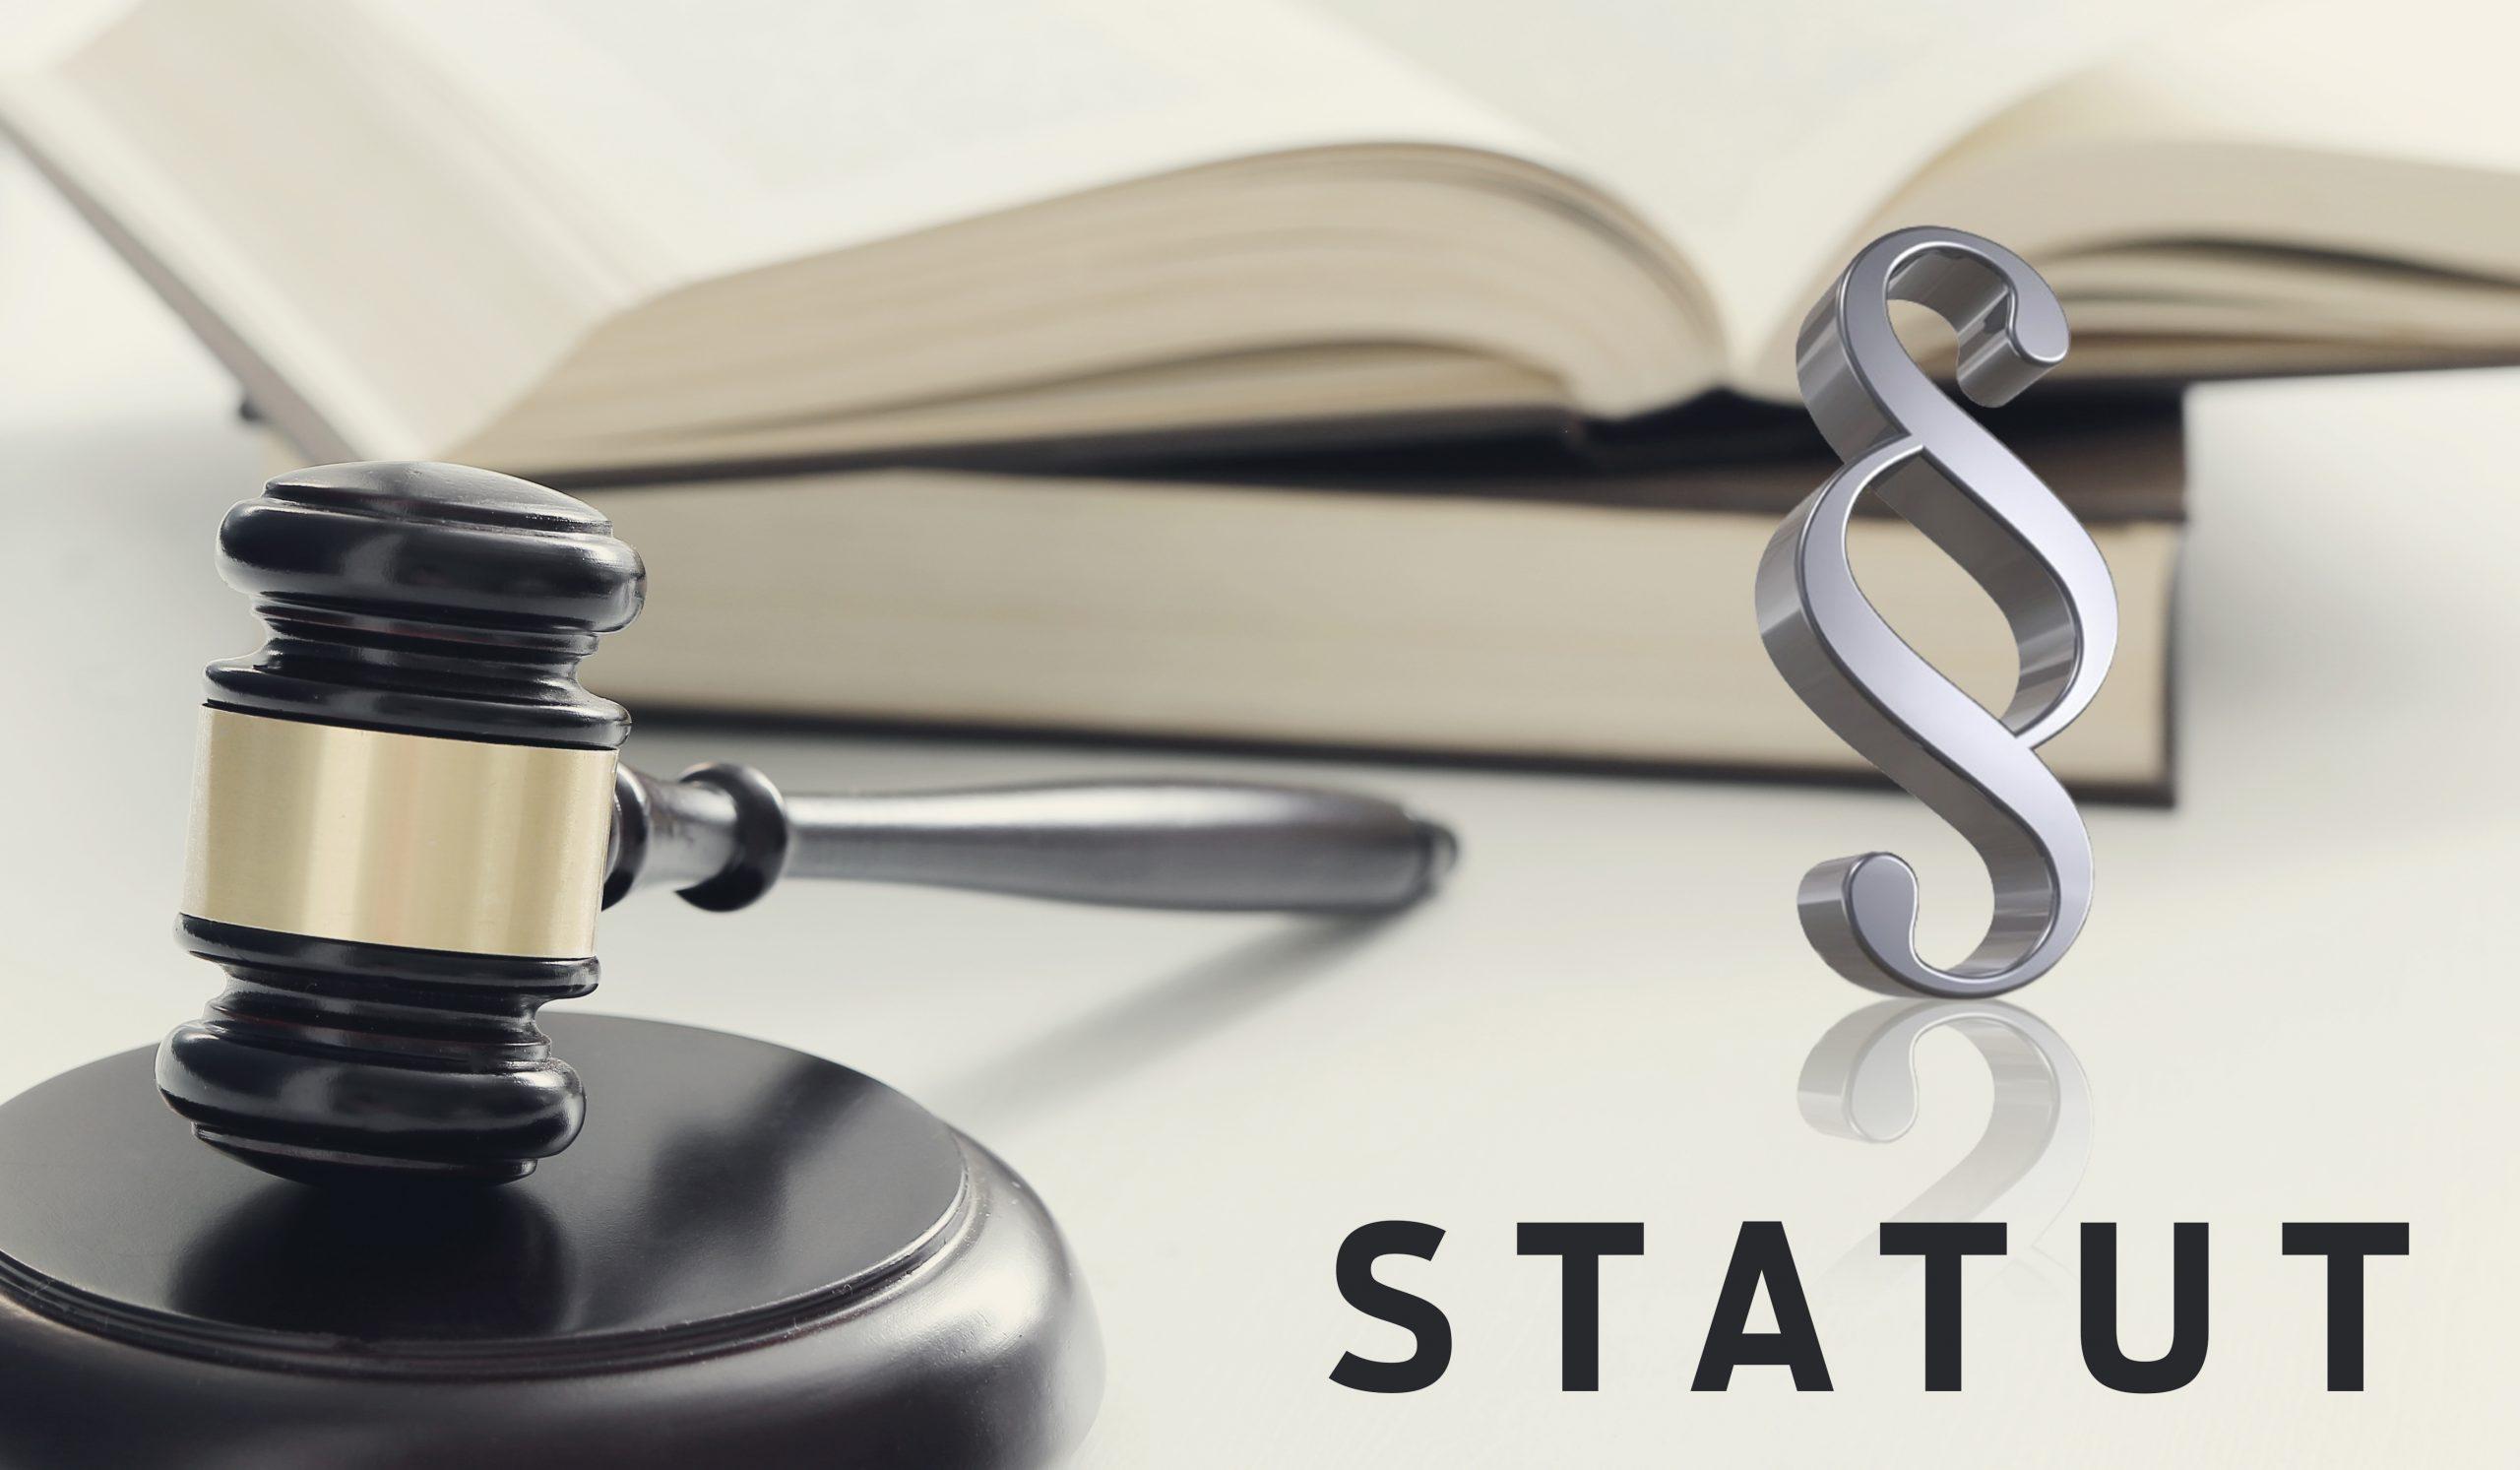 Statut Fundacji Kotwica